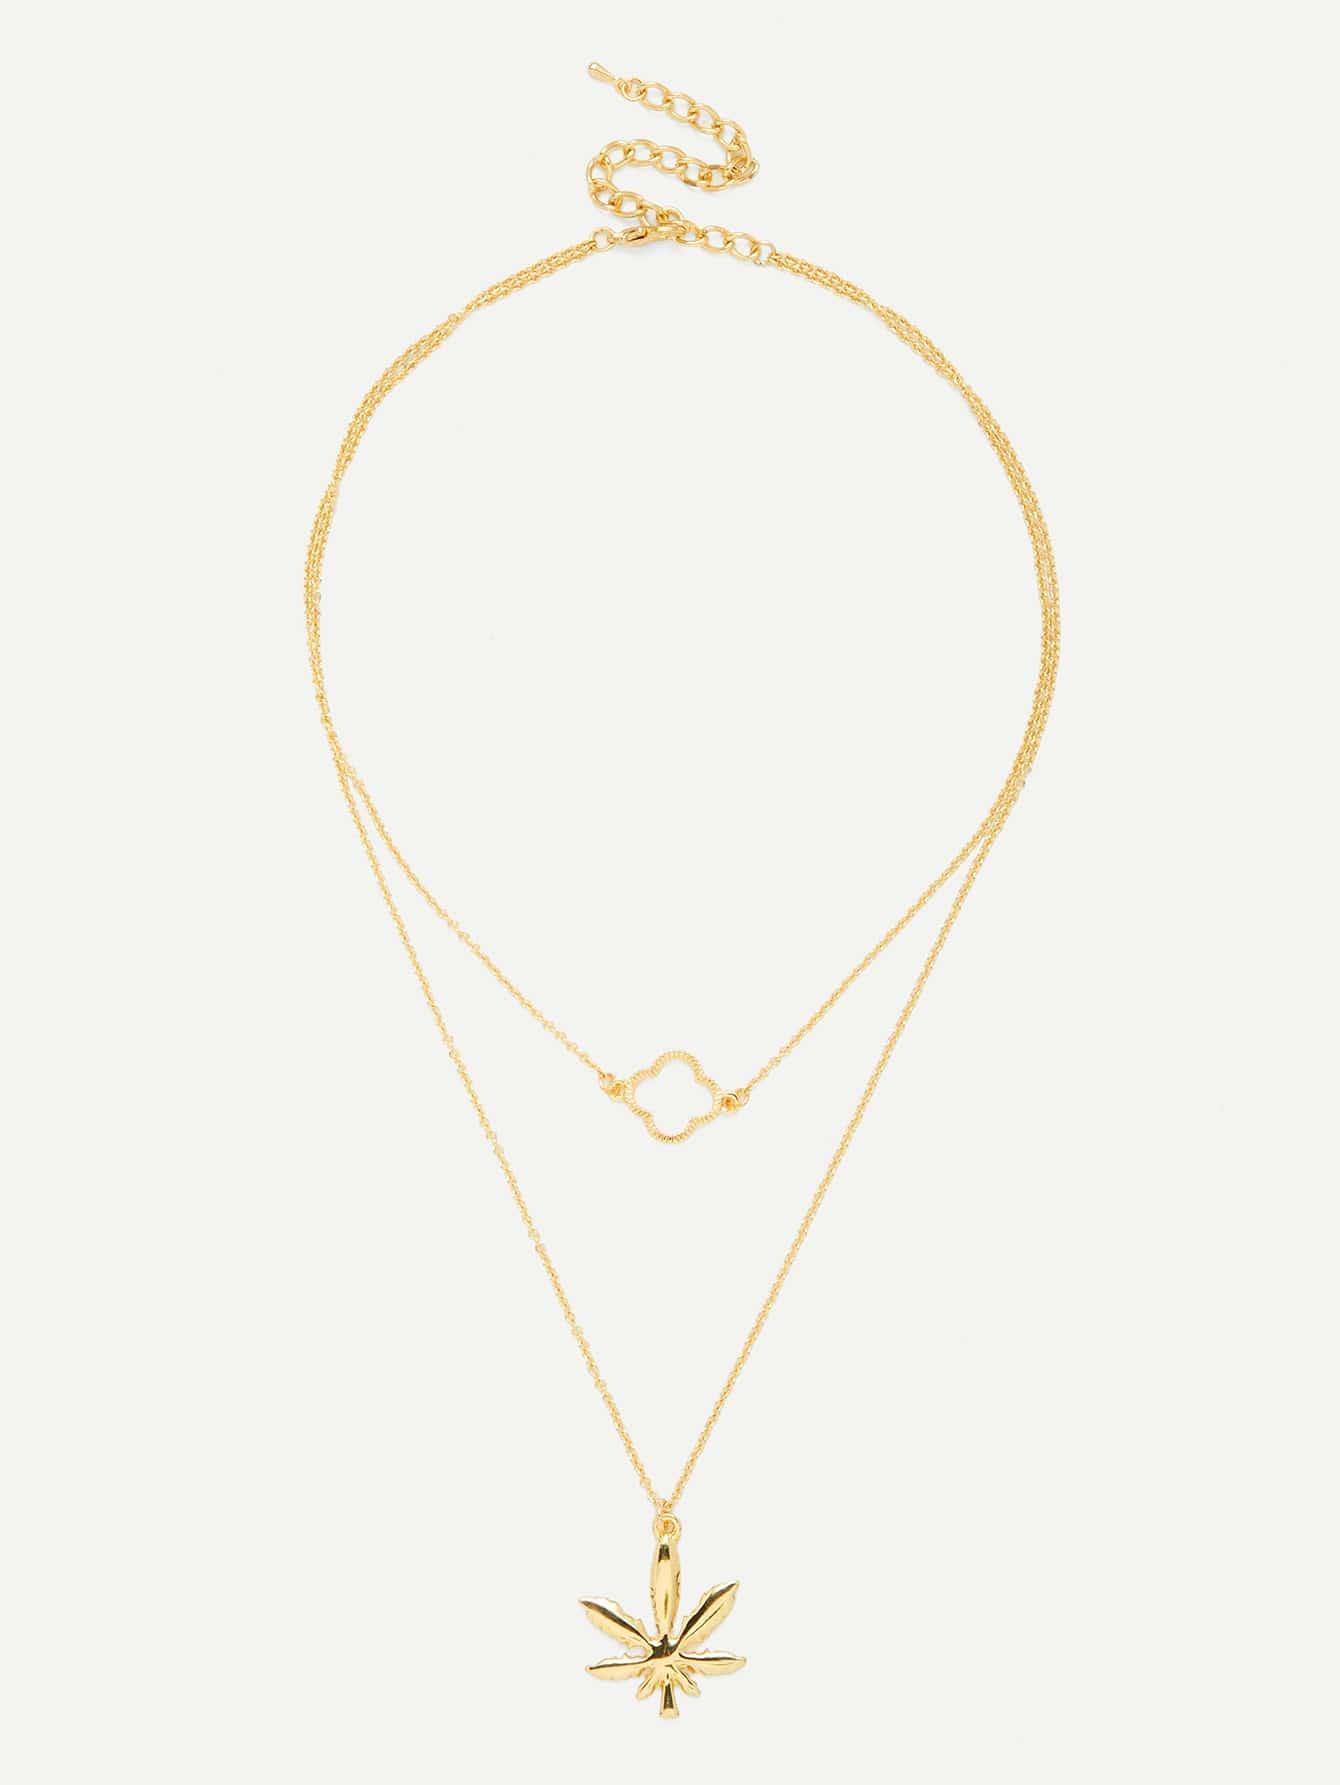 Maple Leaf Pendant Link Layered Necklace юбка fz1850 maple leaf 2014